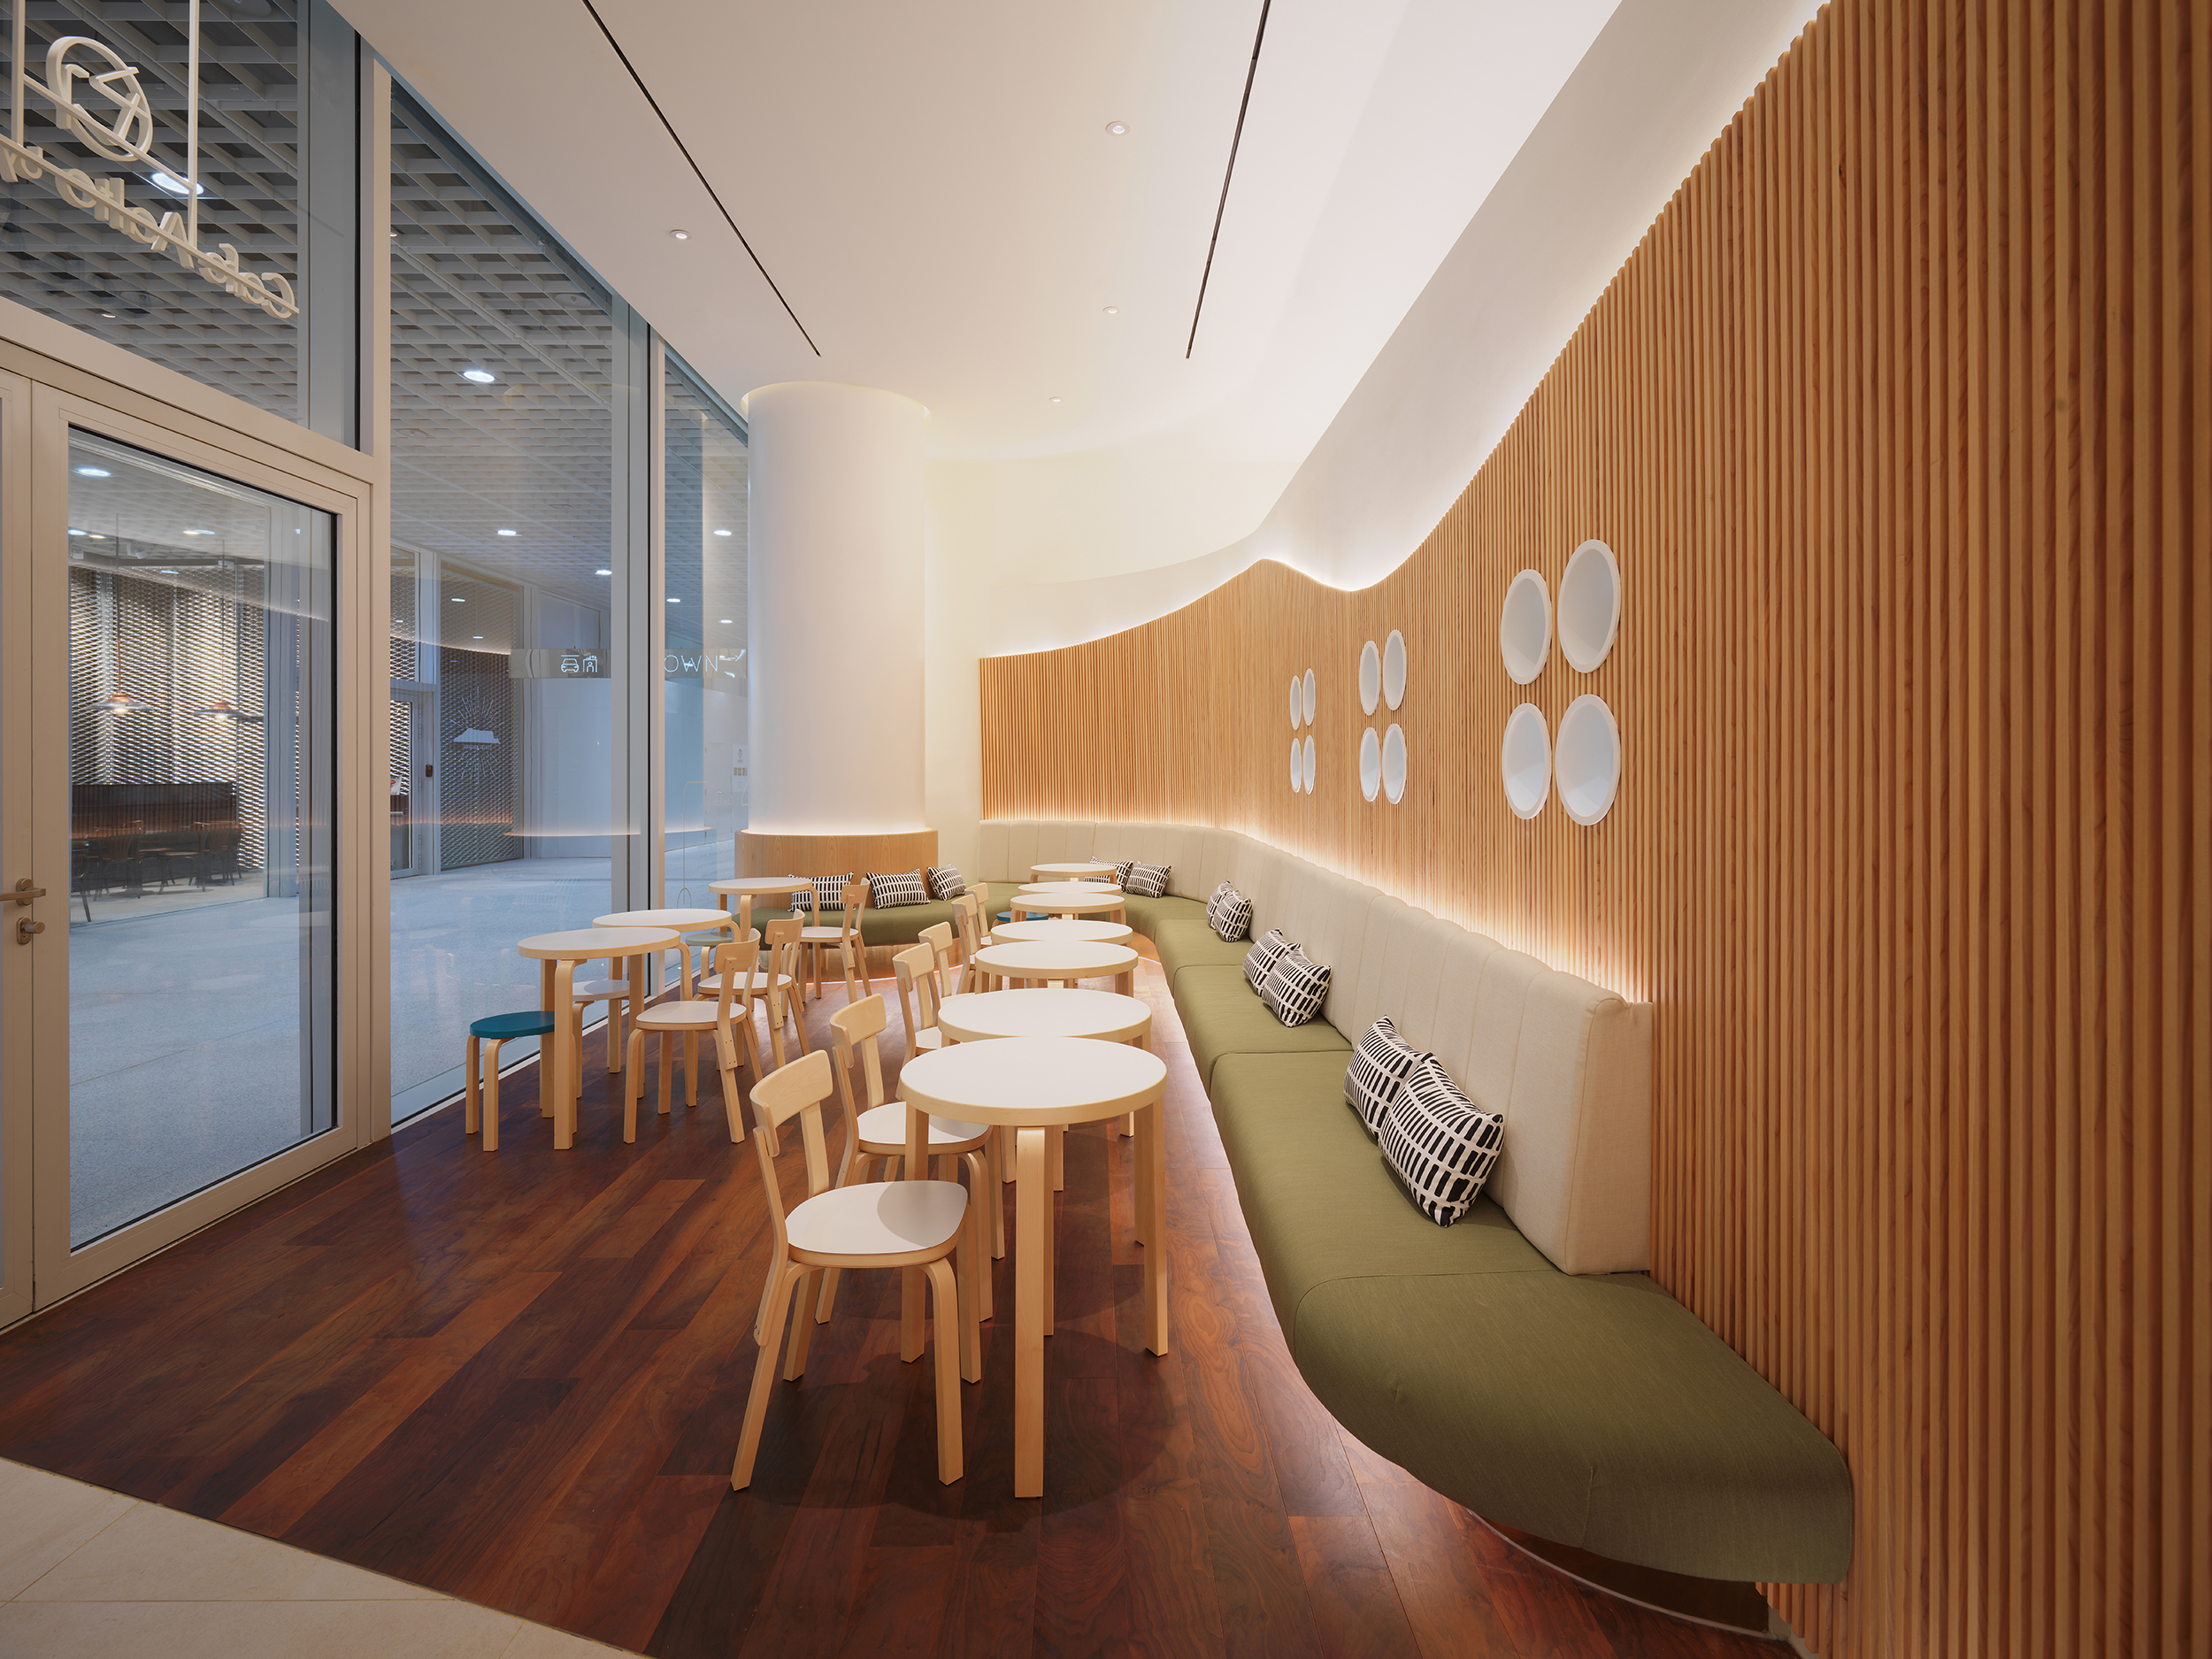 (Teo Yang Studio)Cafe Aalto by Mealdo_11_H resolution.jpg